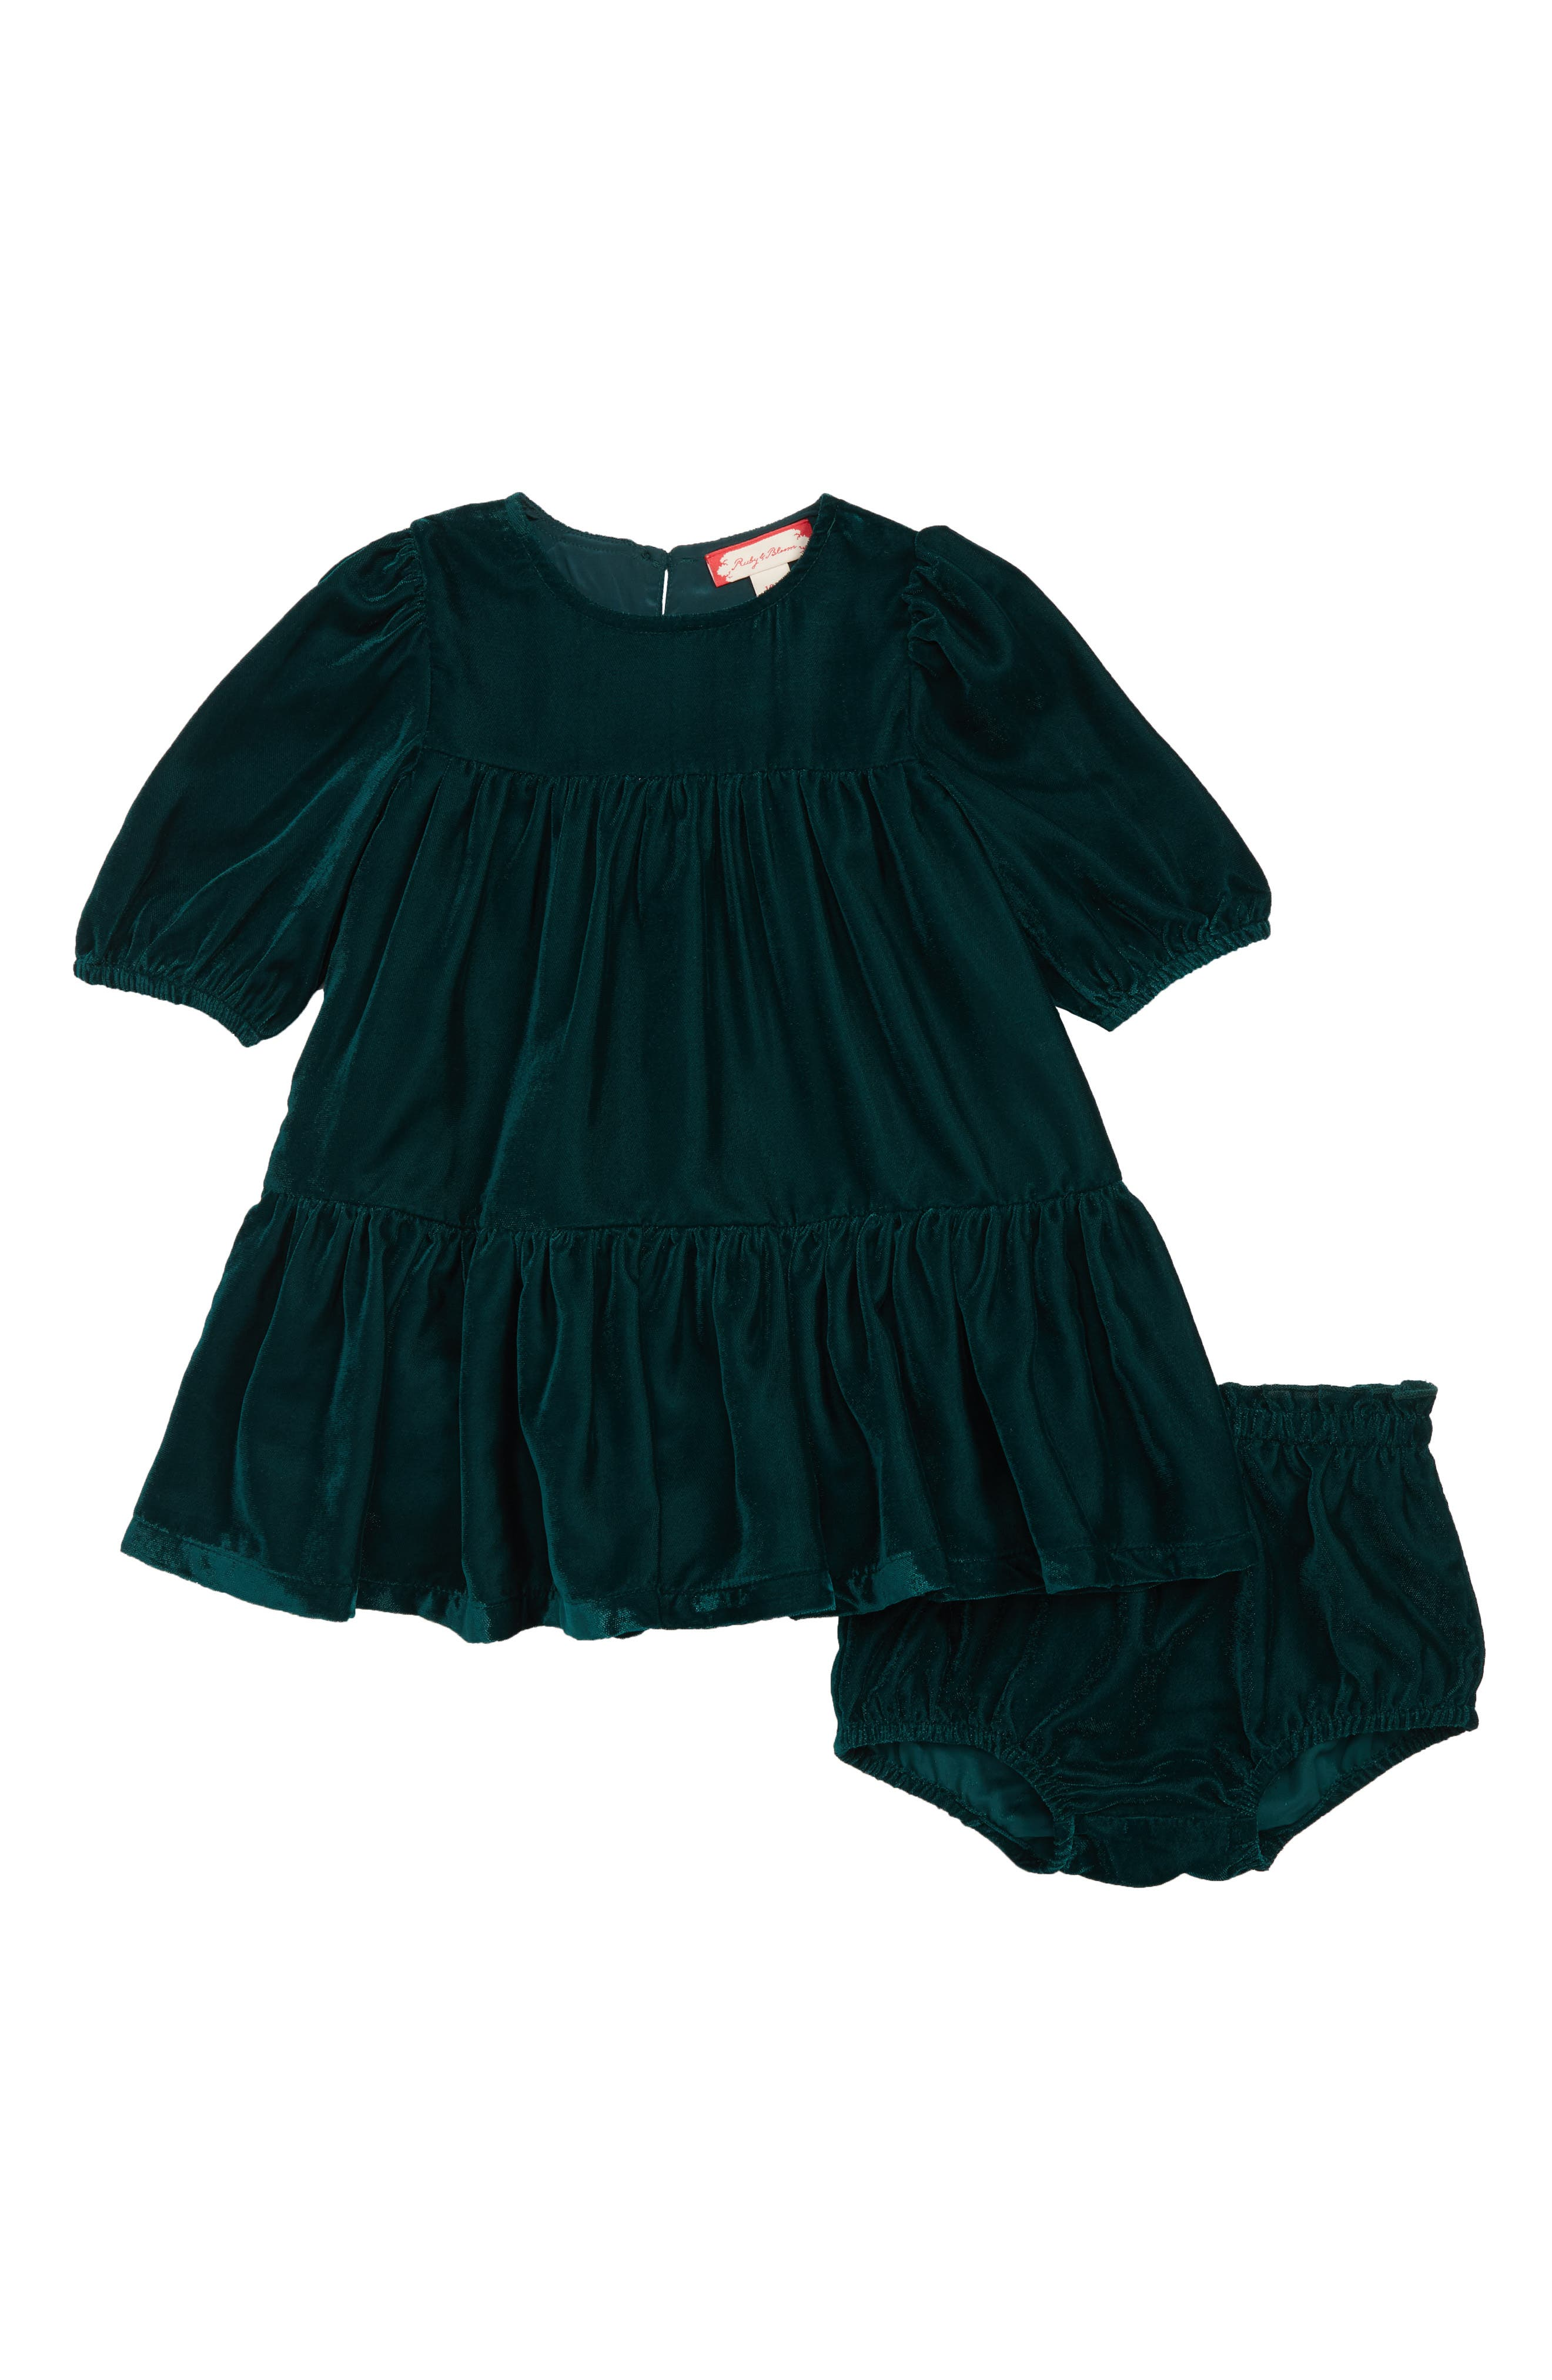 RUBY & BLOOM, Tiered Velvet Dress, Main thumbnail 1, color, 301